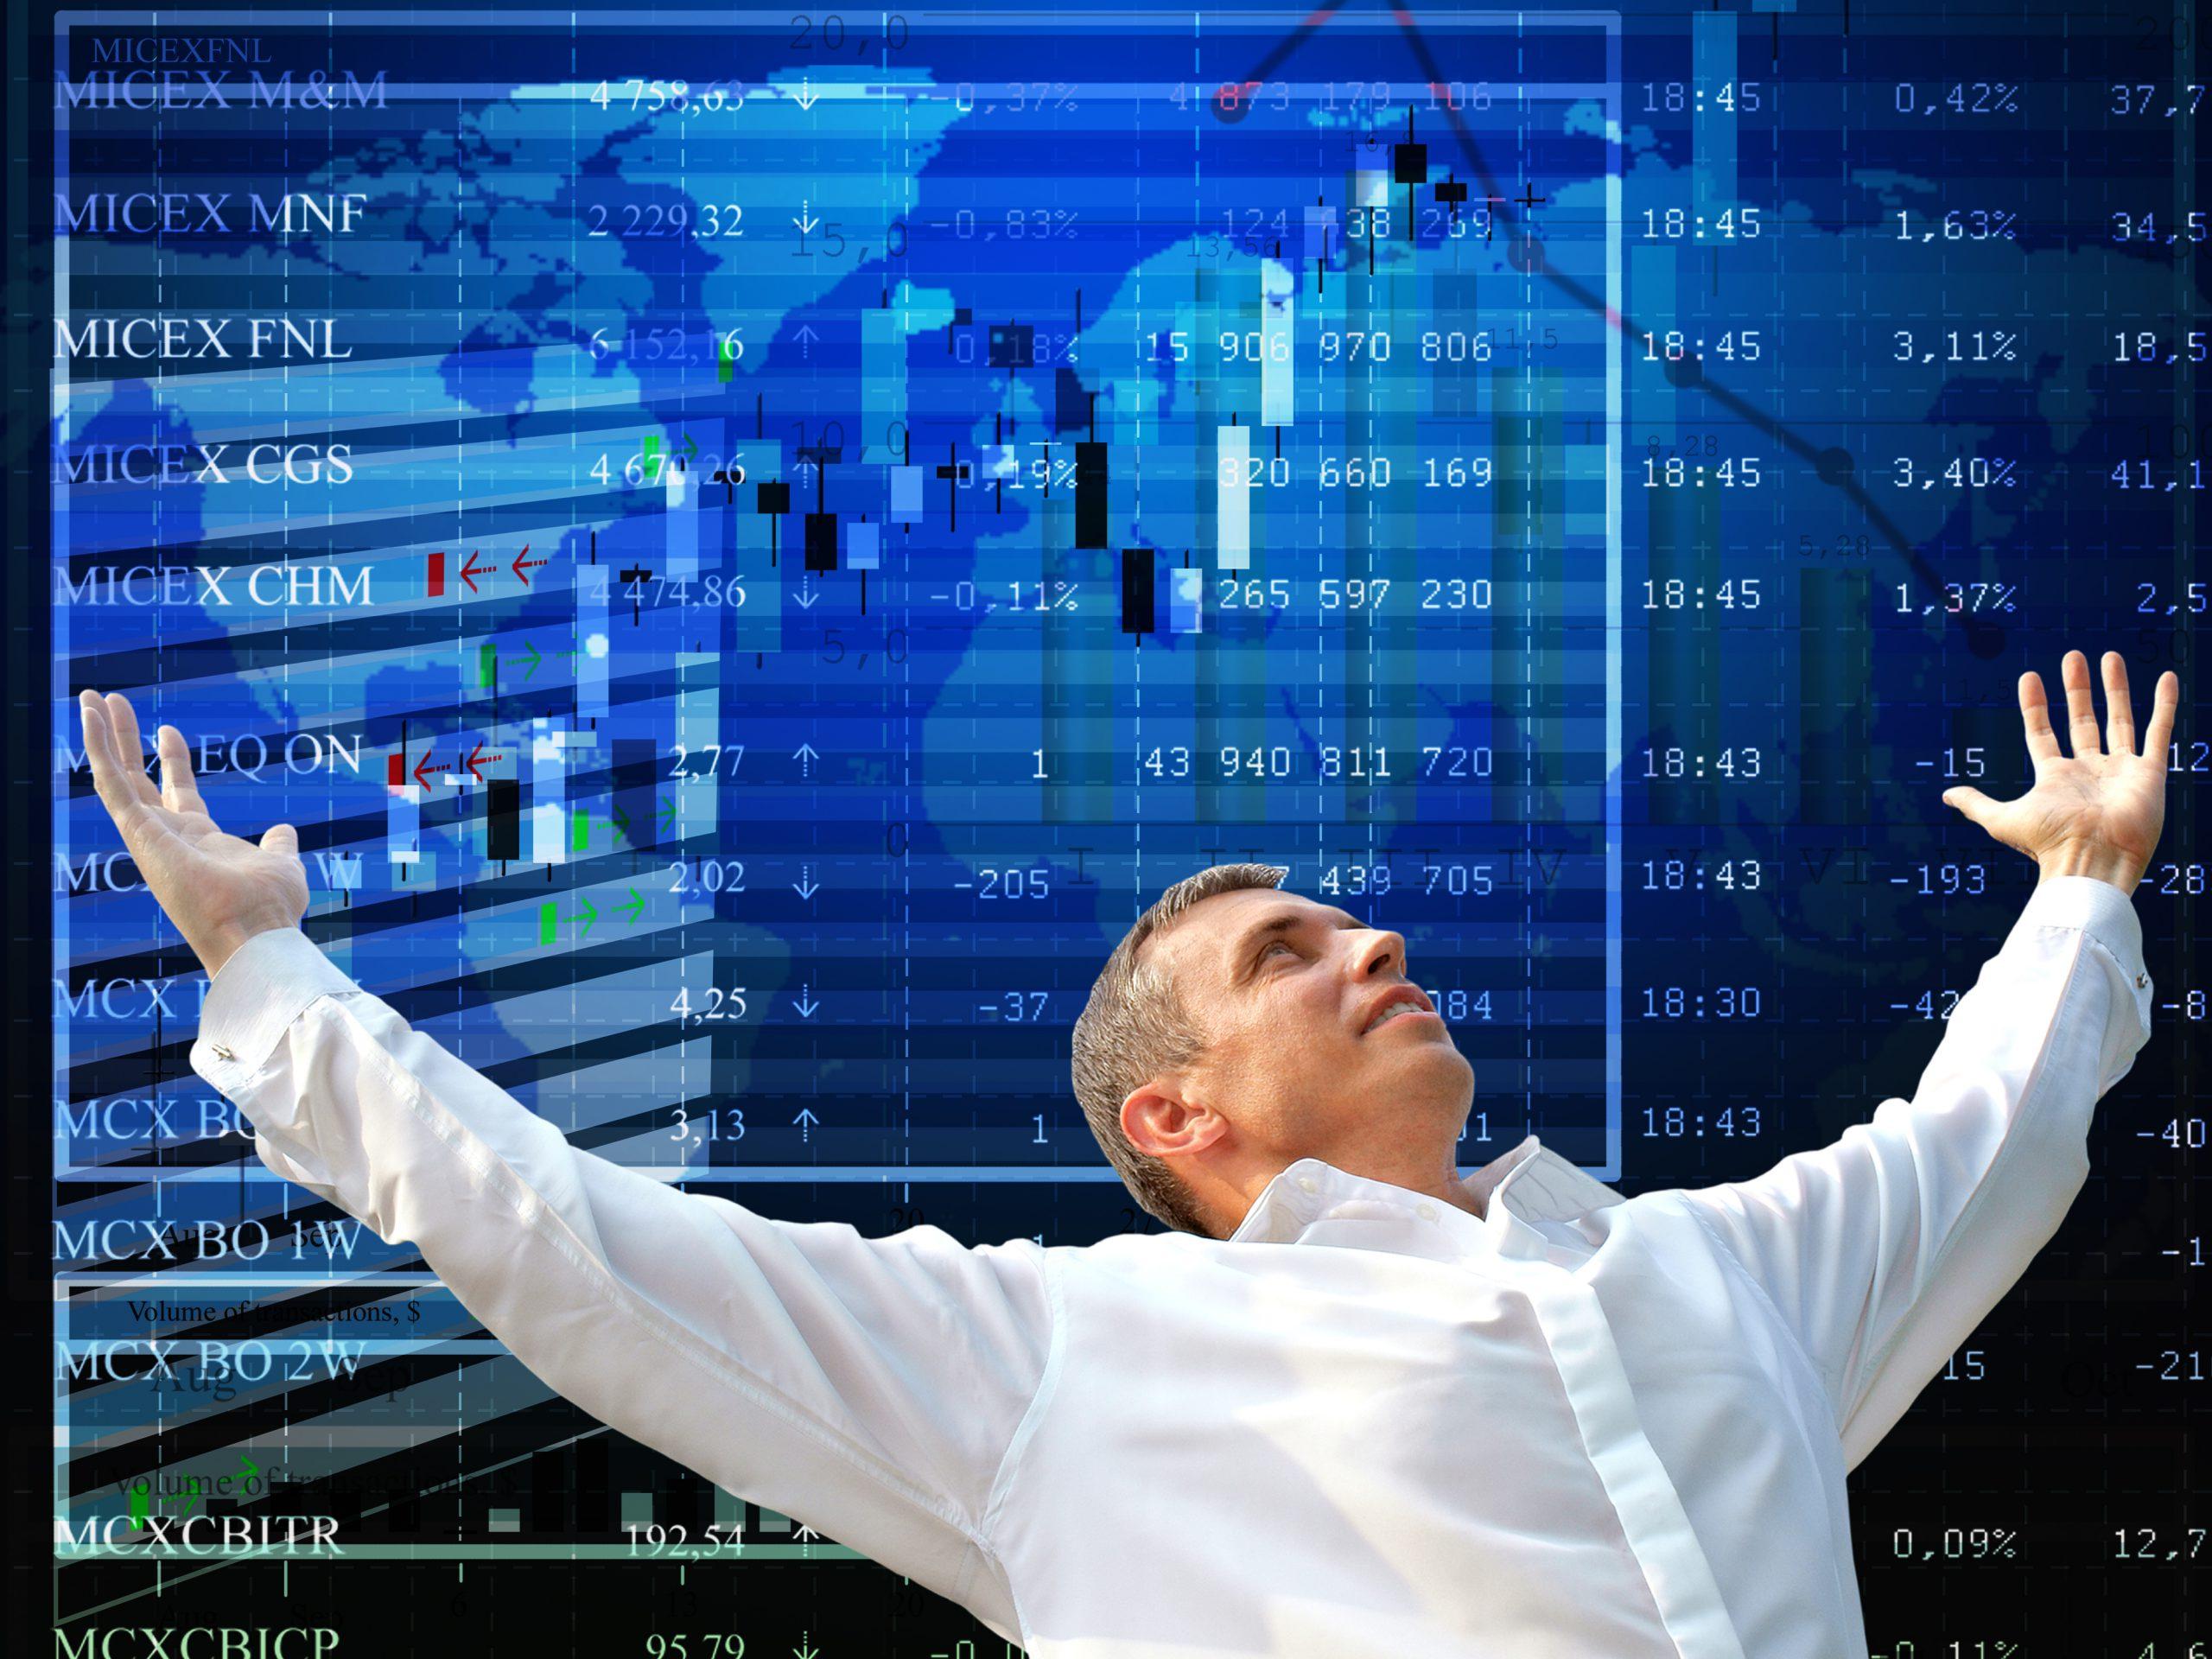 NASDAQ: AMZN   Amazon.com, Inc. News, Ratings, and Charts